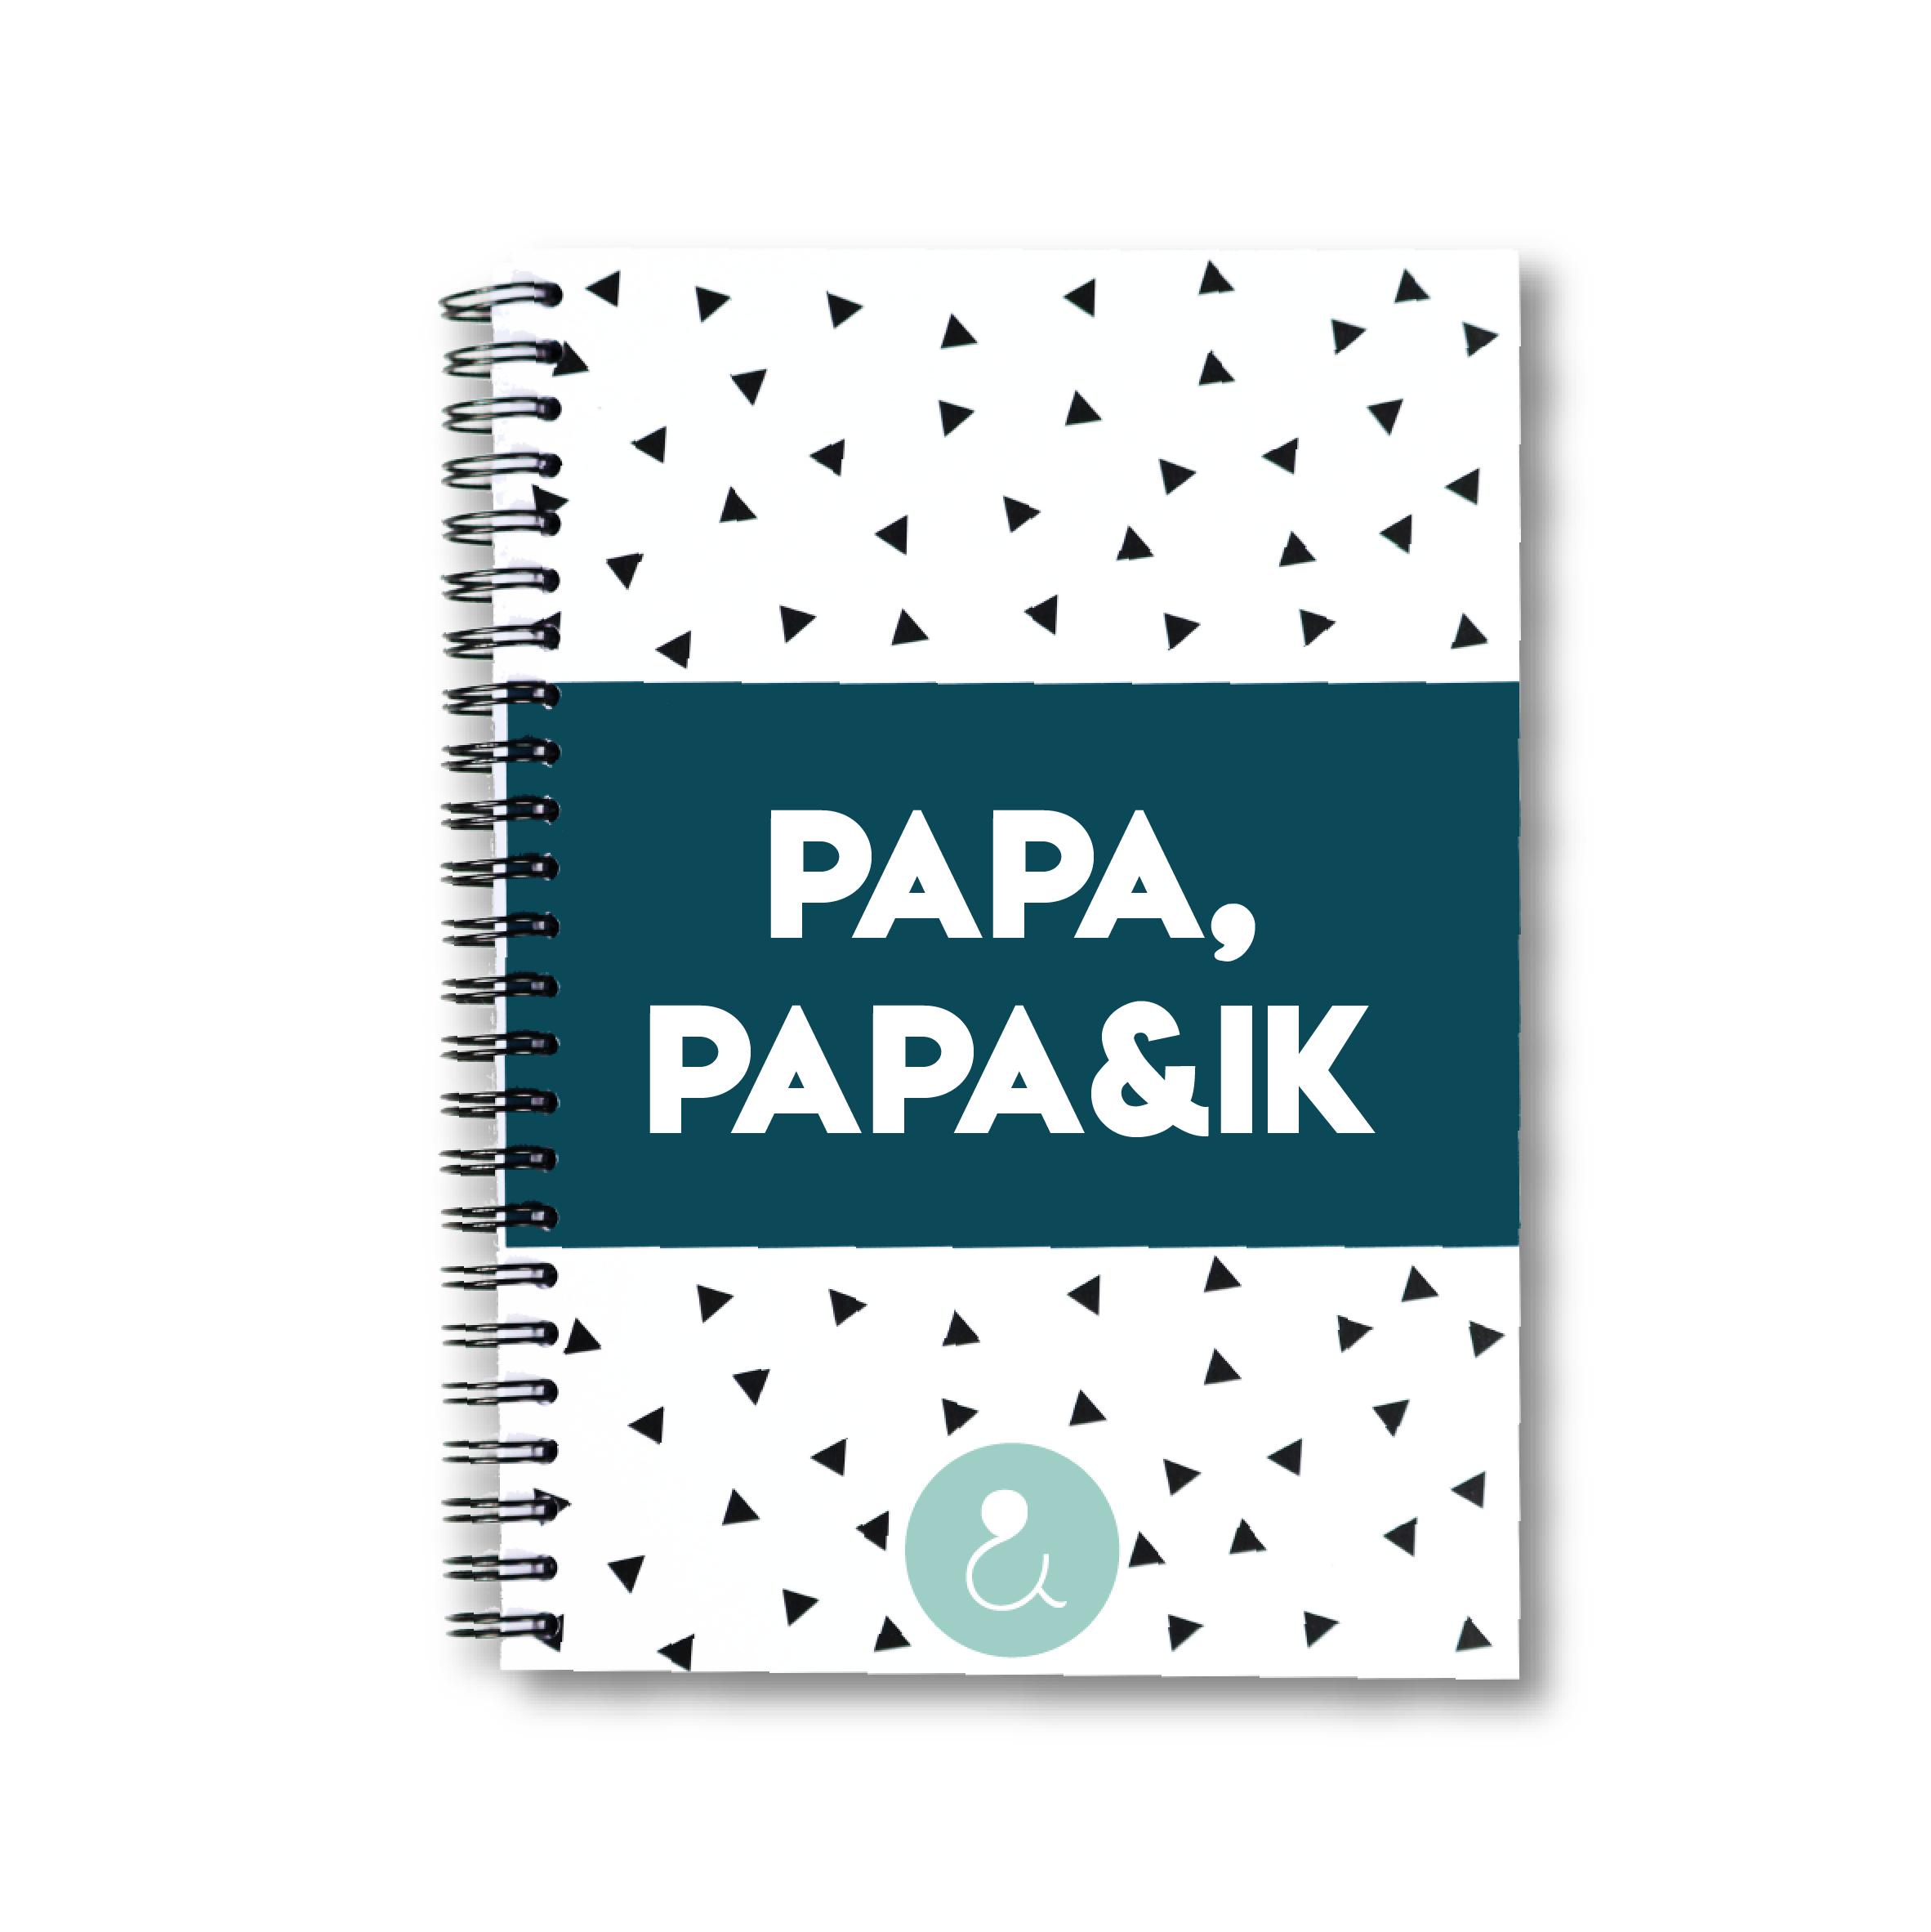 Papa, papa&ik | invulboek voor papa's (mint stip)